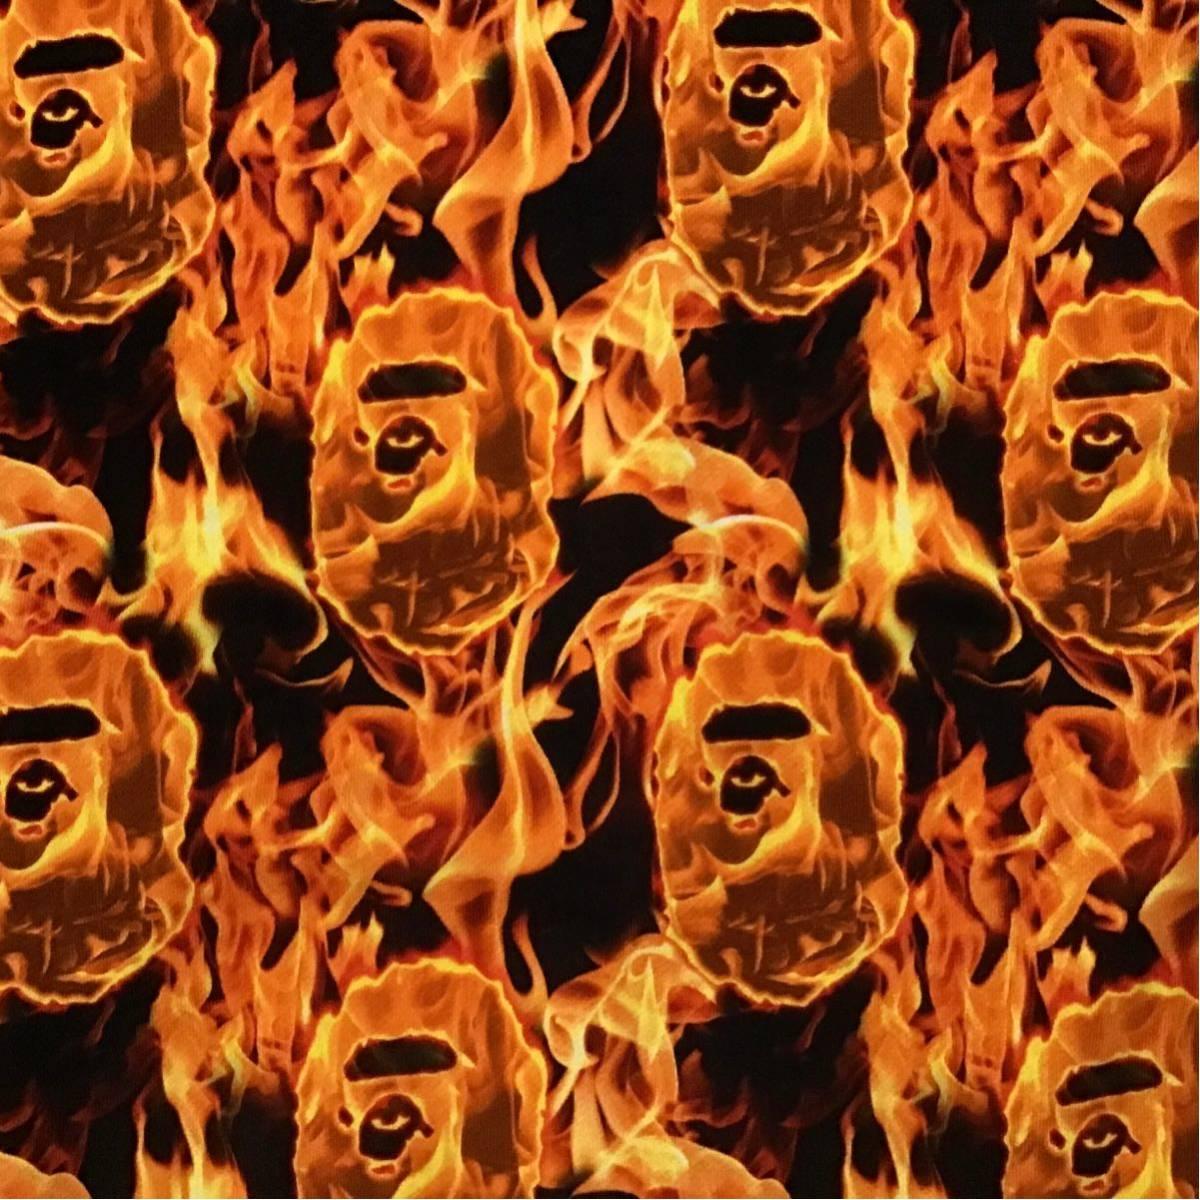 ★XL★ BAPE FLAME フルジップ パーカー a bathing ape BAPE fire full zip hoodie エイプ ベイプ アベイシングエイプ ka6